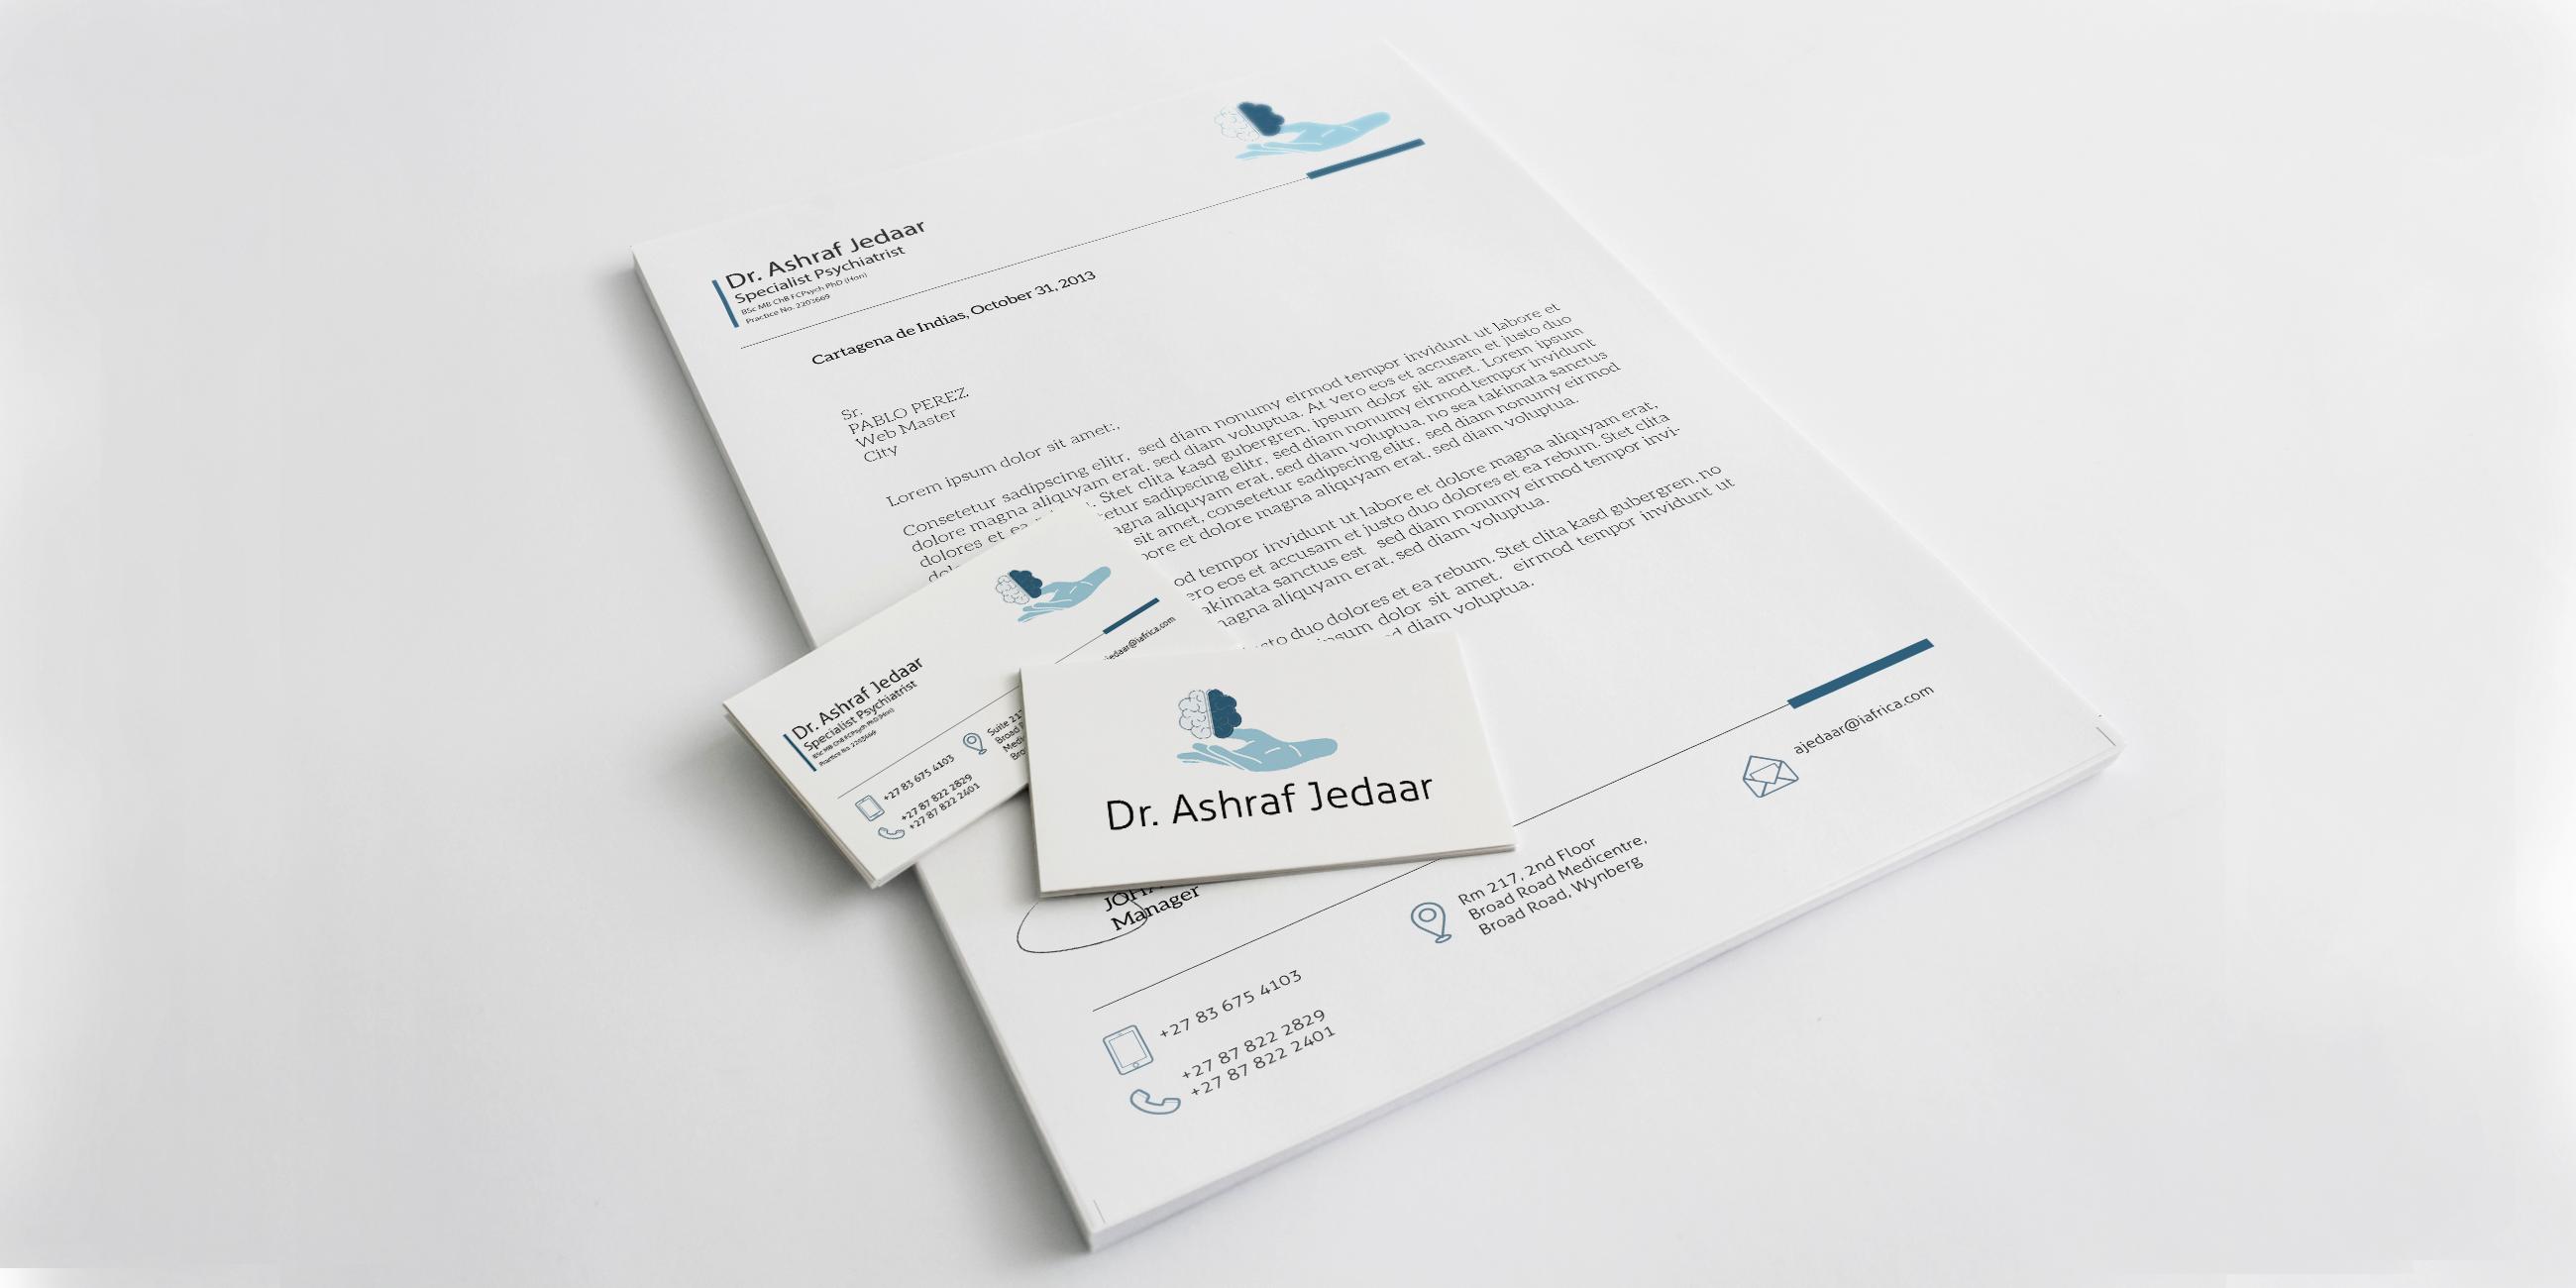 Dr Ashraf Jedaar